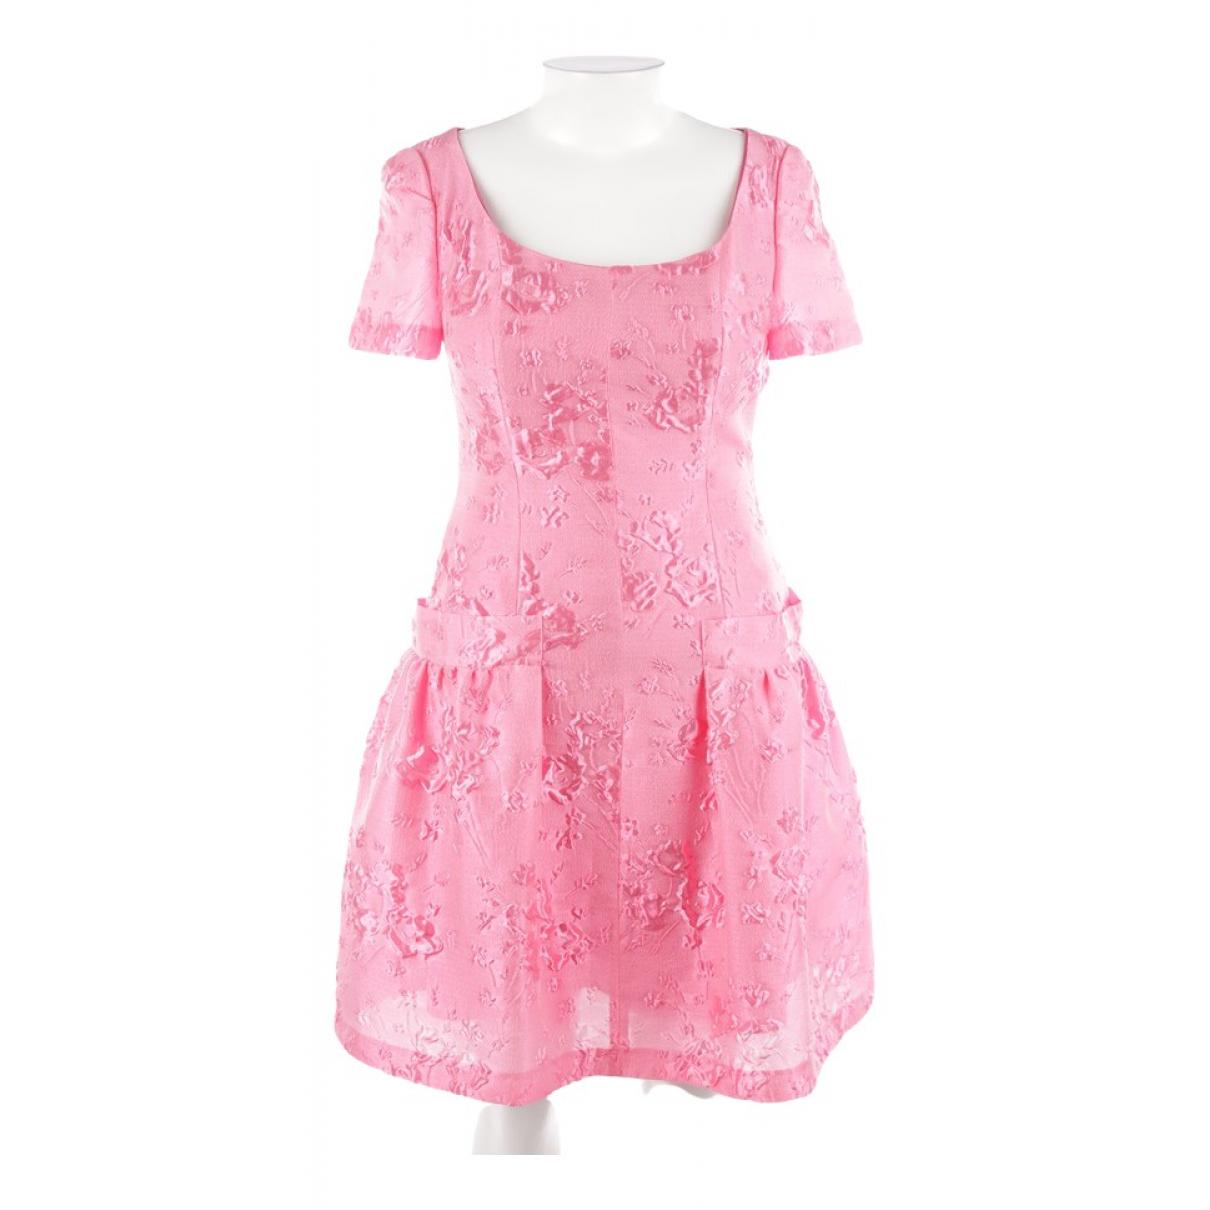 Talbot Runhof \N Kleid in  Rosa Polyester